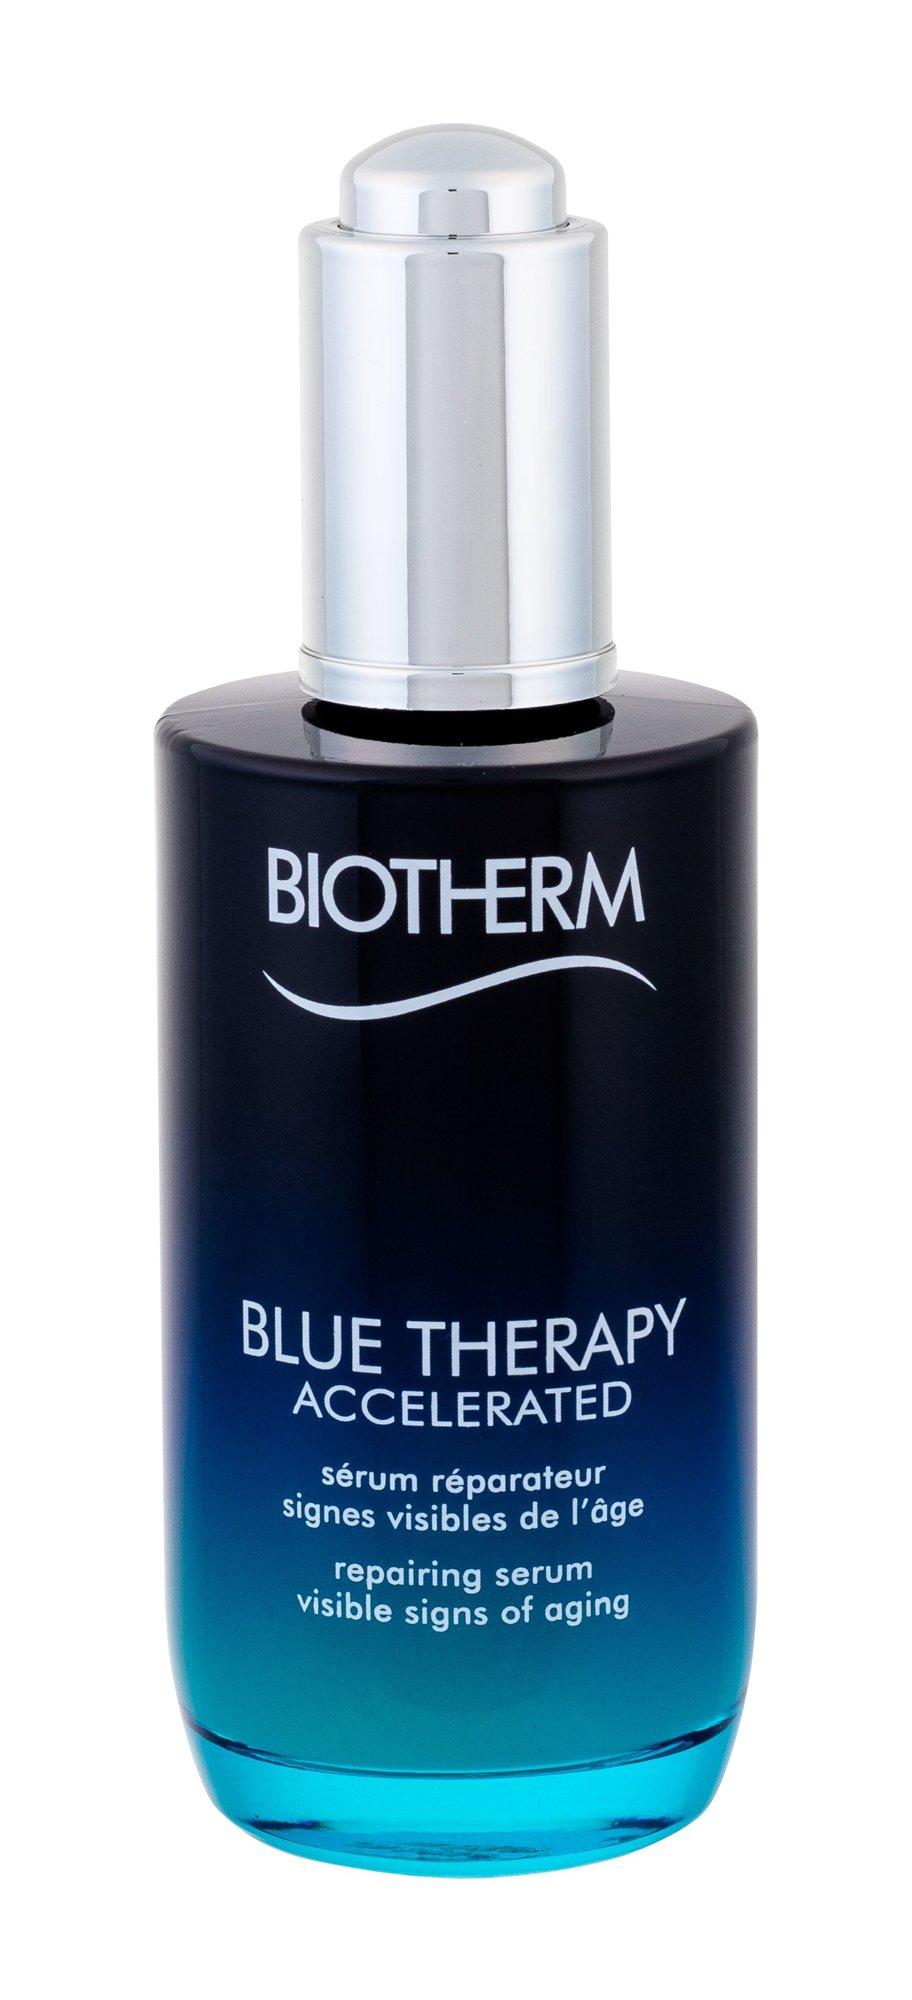 Biotherm Blue Therapy Skin Serum 75ml  Serum Accelerated